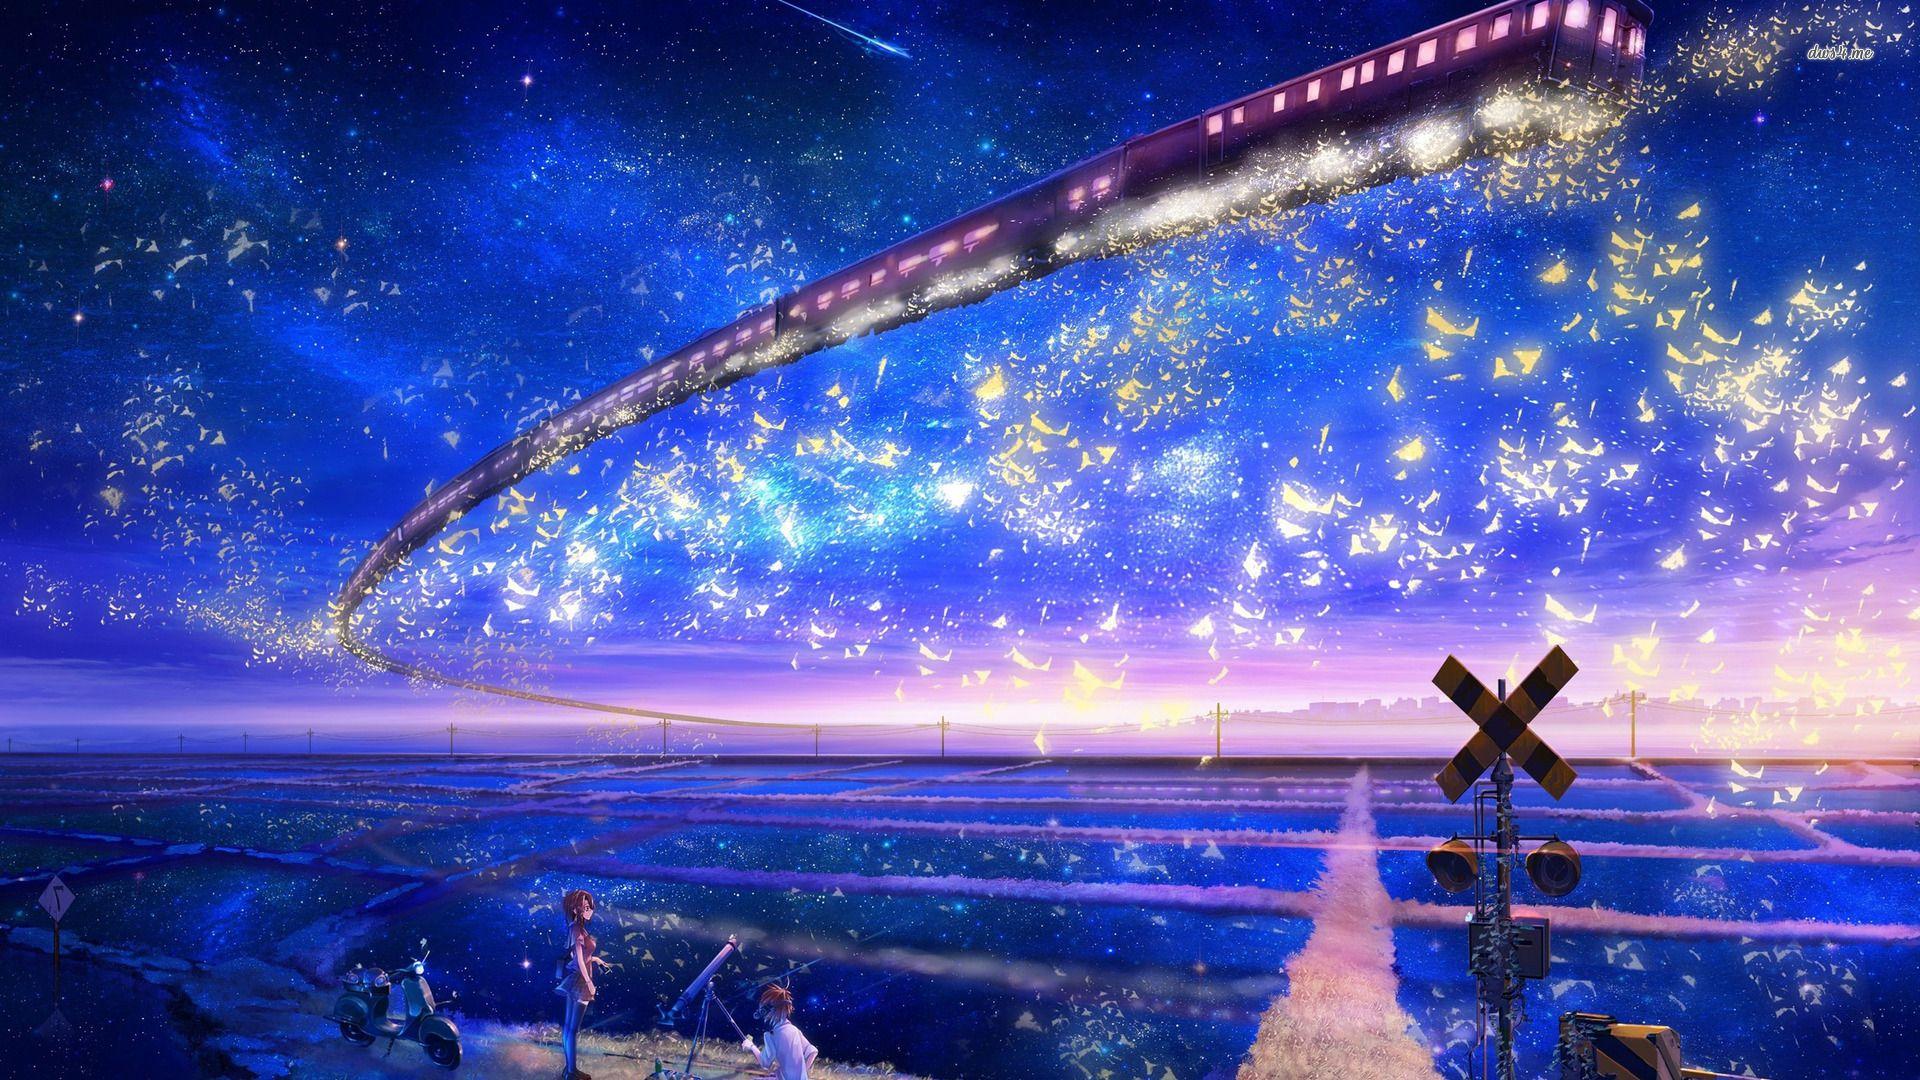 Hd Wallpaper Anime Wallpaper X Sky Anime Anime Stars Anime Galaxy